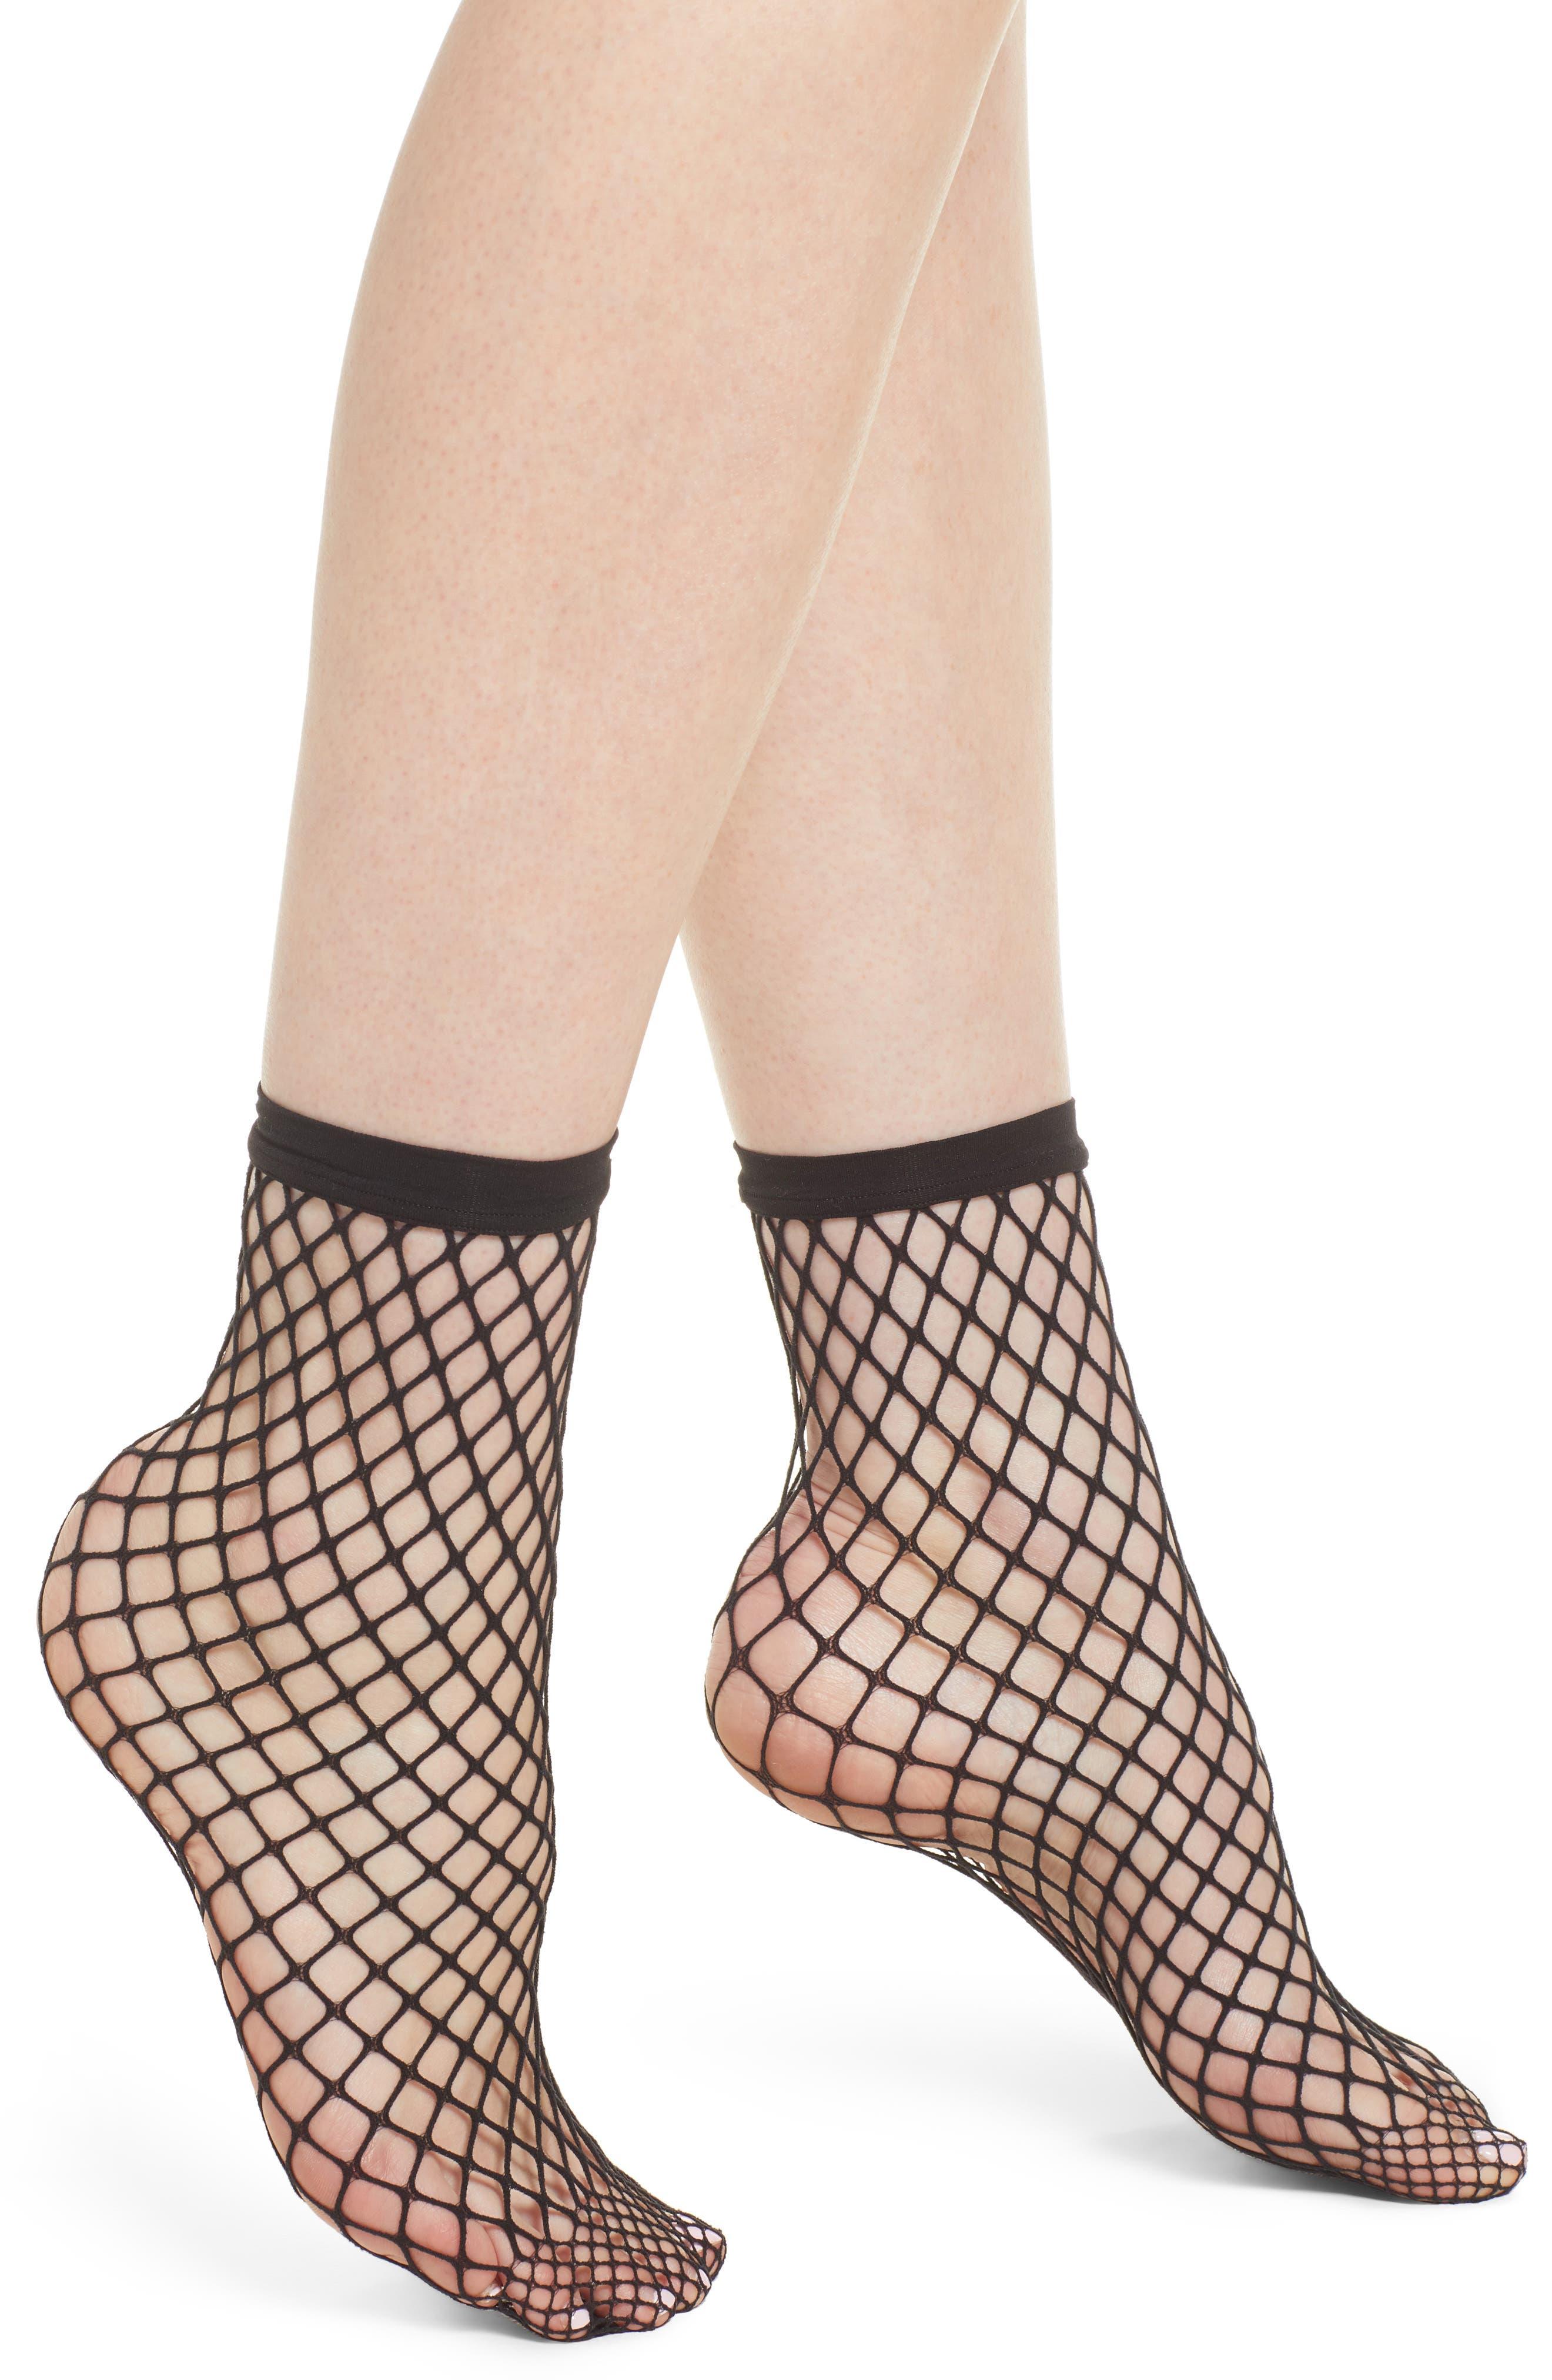 Tina Summer Net Ankle Socks,                             Main thumbnail 1, color,                             016